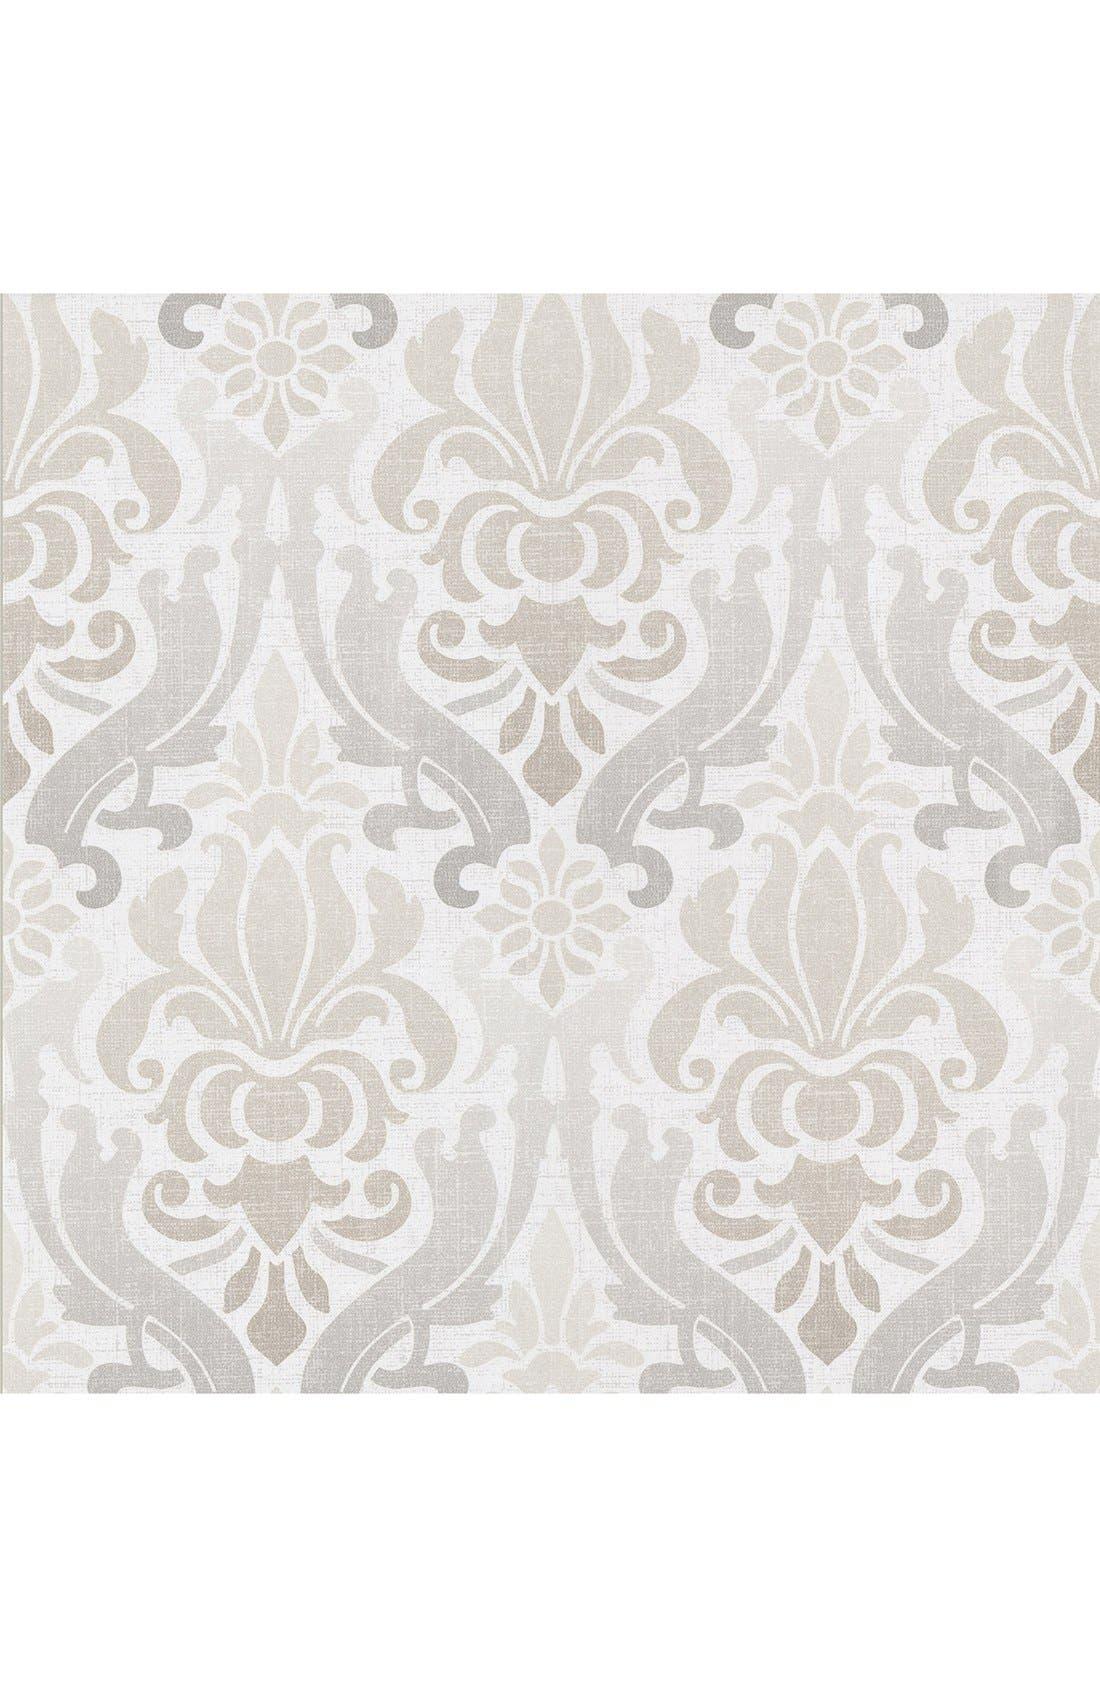 Alternate Image 1 Selected - Wallpops 'Aquitain Nouveau Damask' Unpasted Wallpaper